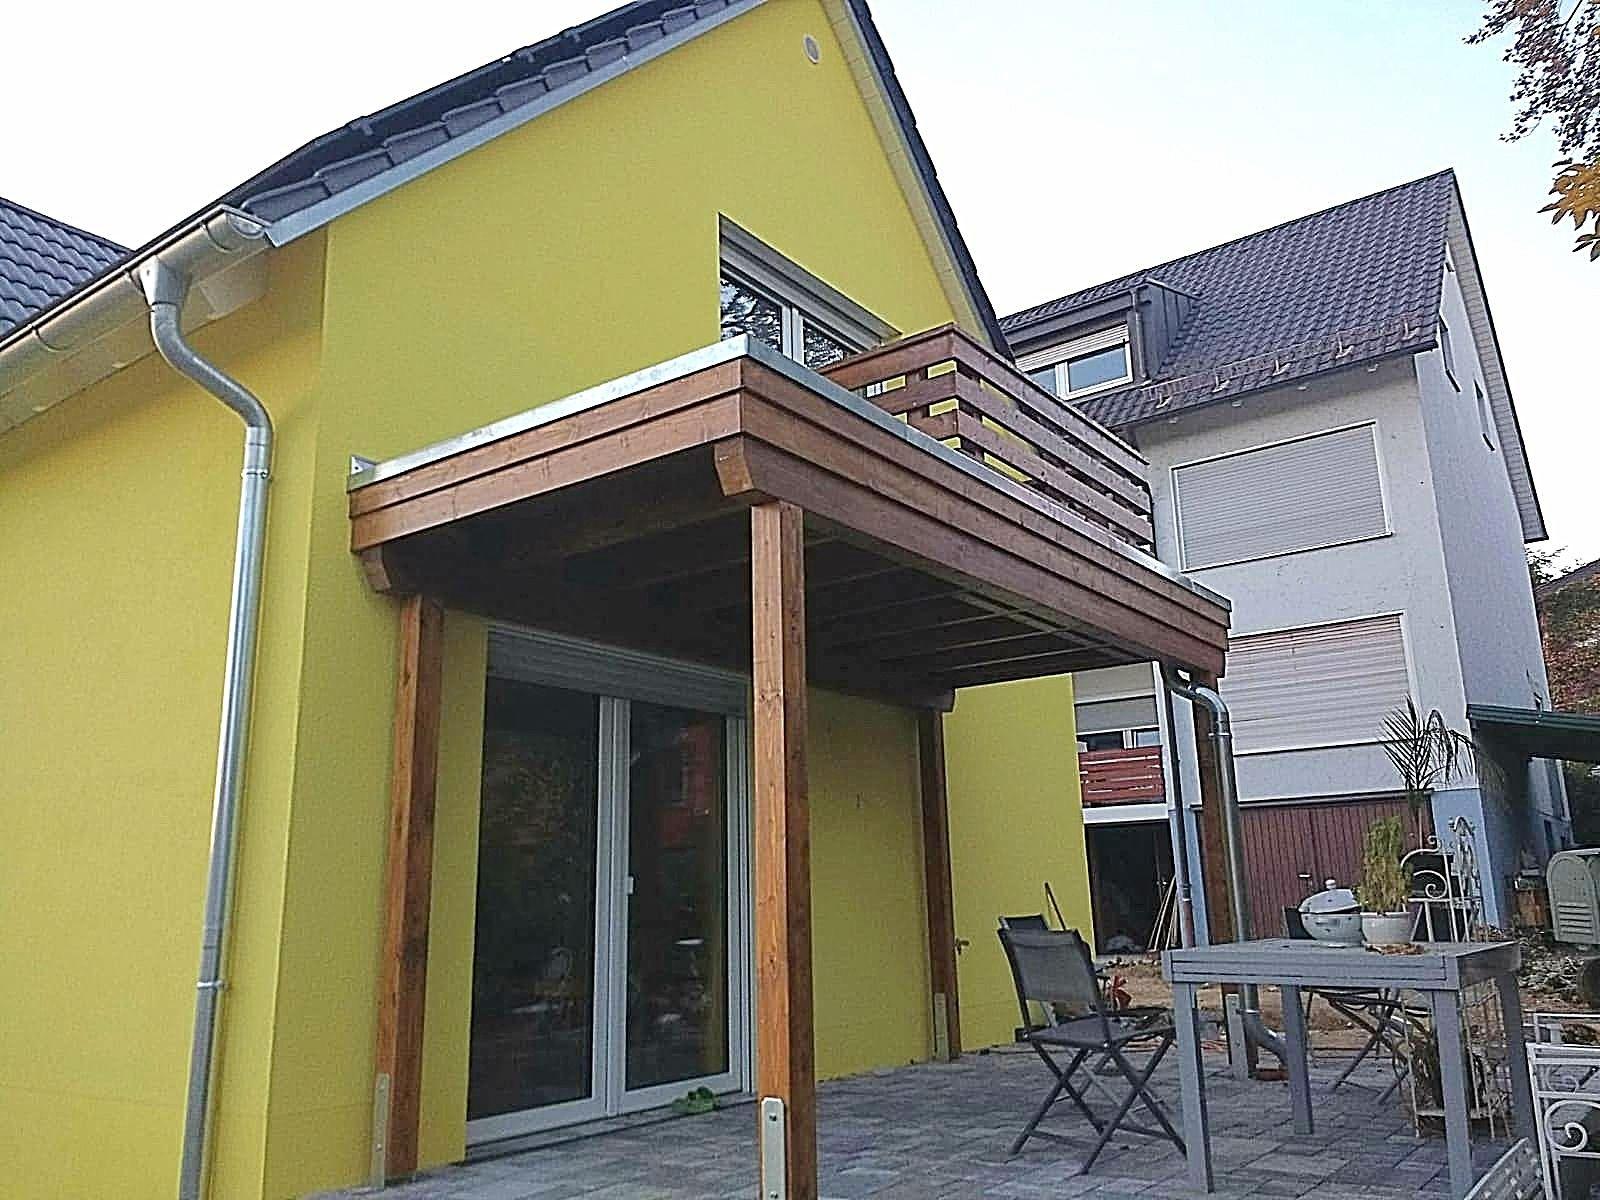 Balkon Carports Carport In Holz Alu Stahl Carport Bausatz Balkon Bausatz Carports Carport Holz